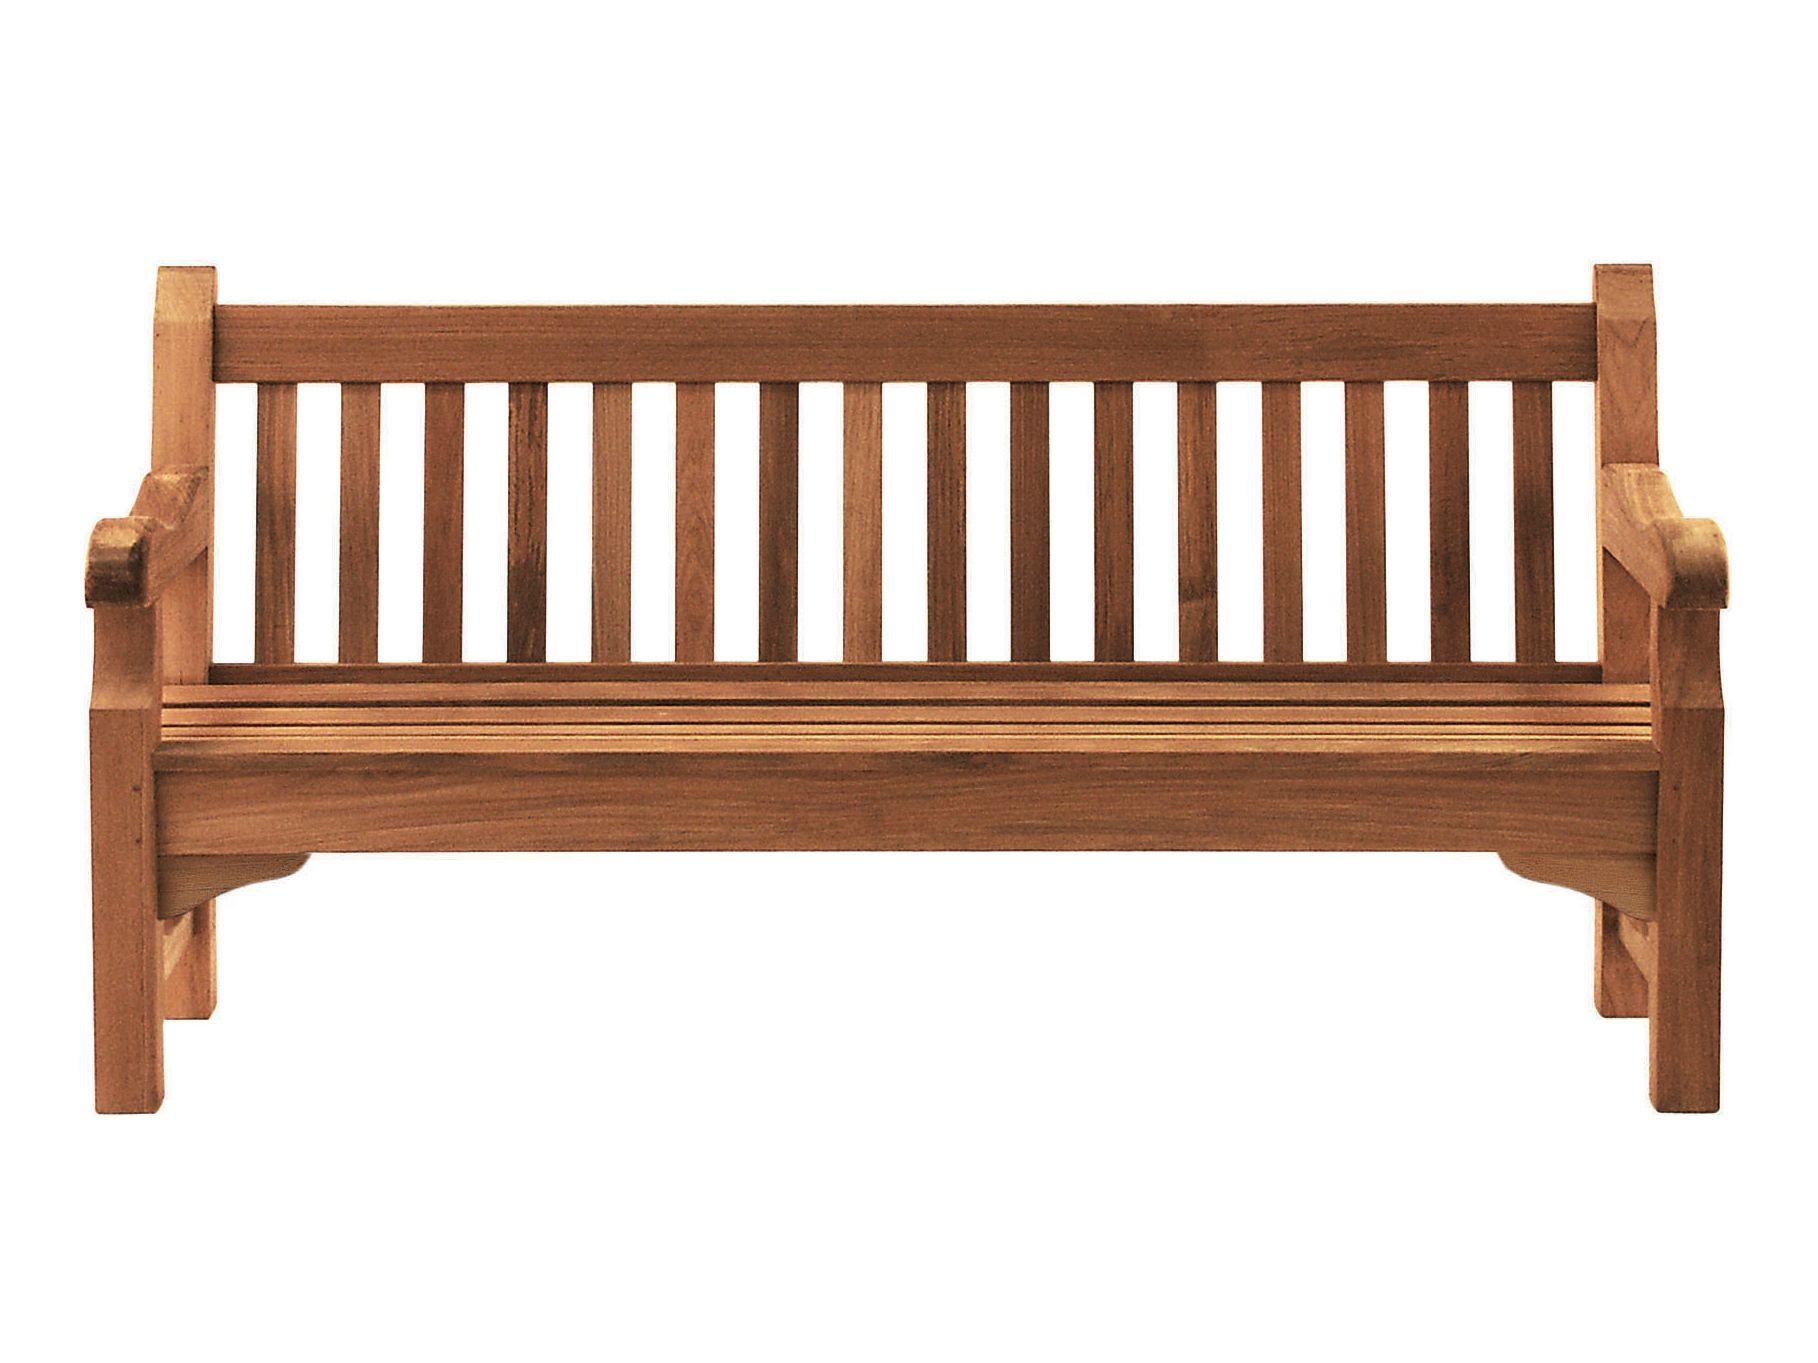 banc de jardin en teck avec accoudoirs exbury by tectona. Black Bedroom Furniture Sets. Home Design Ideas